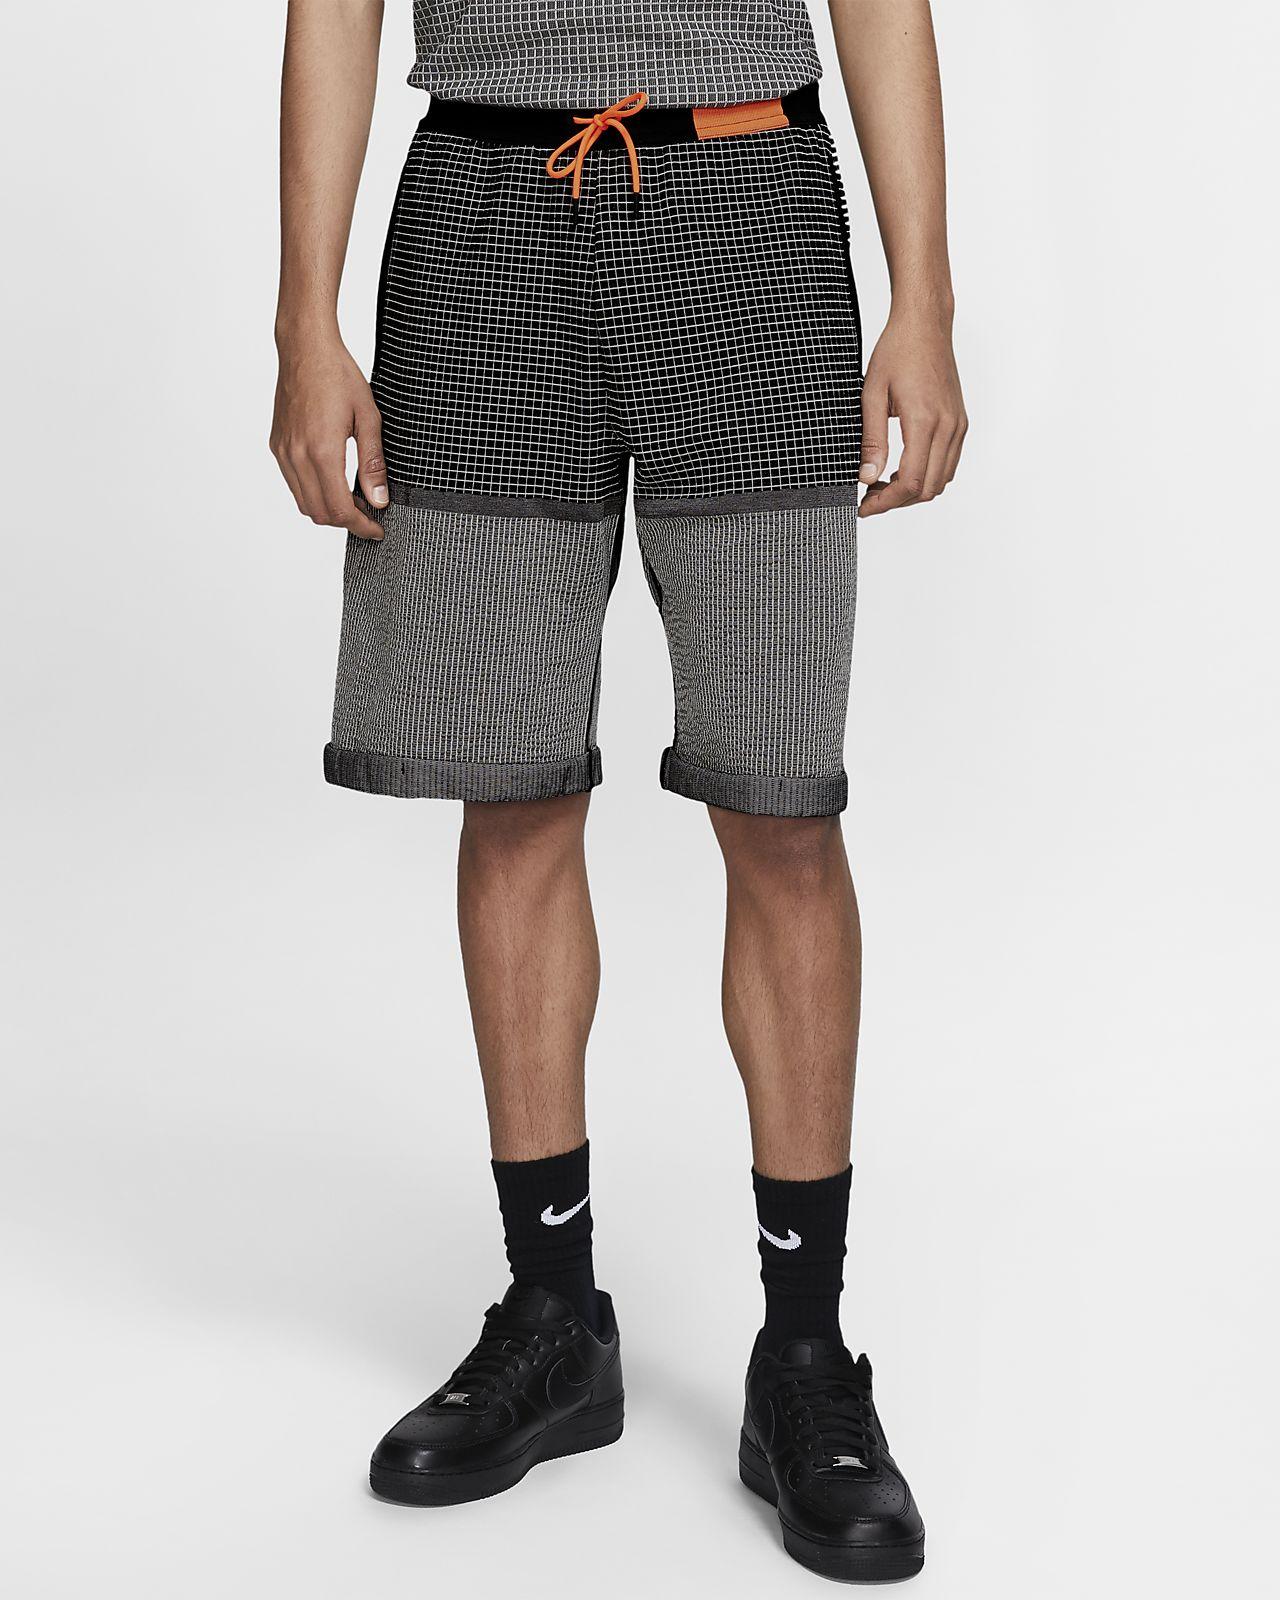 fc786682d Nike Sportswear Tech Pack kötött férfi rövidnadrág. Nike.com HU